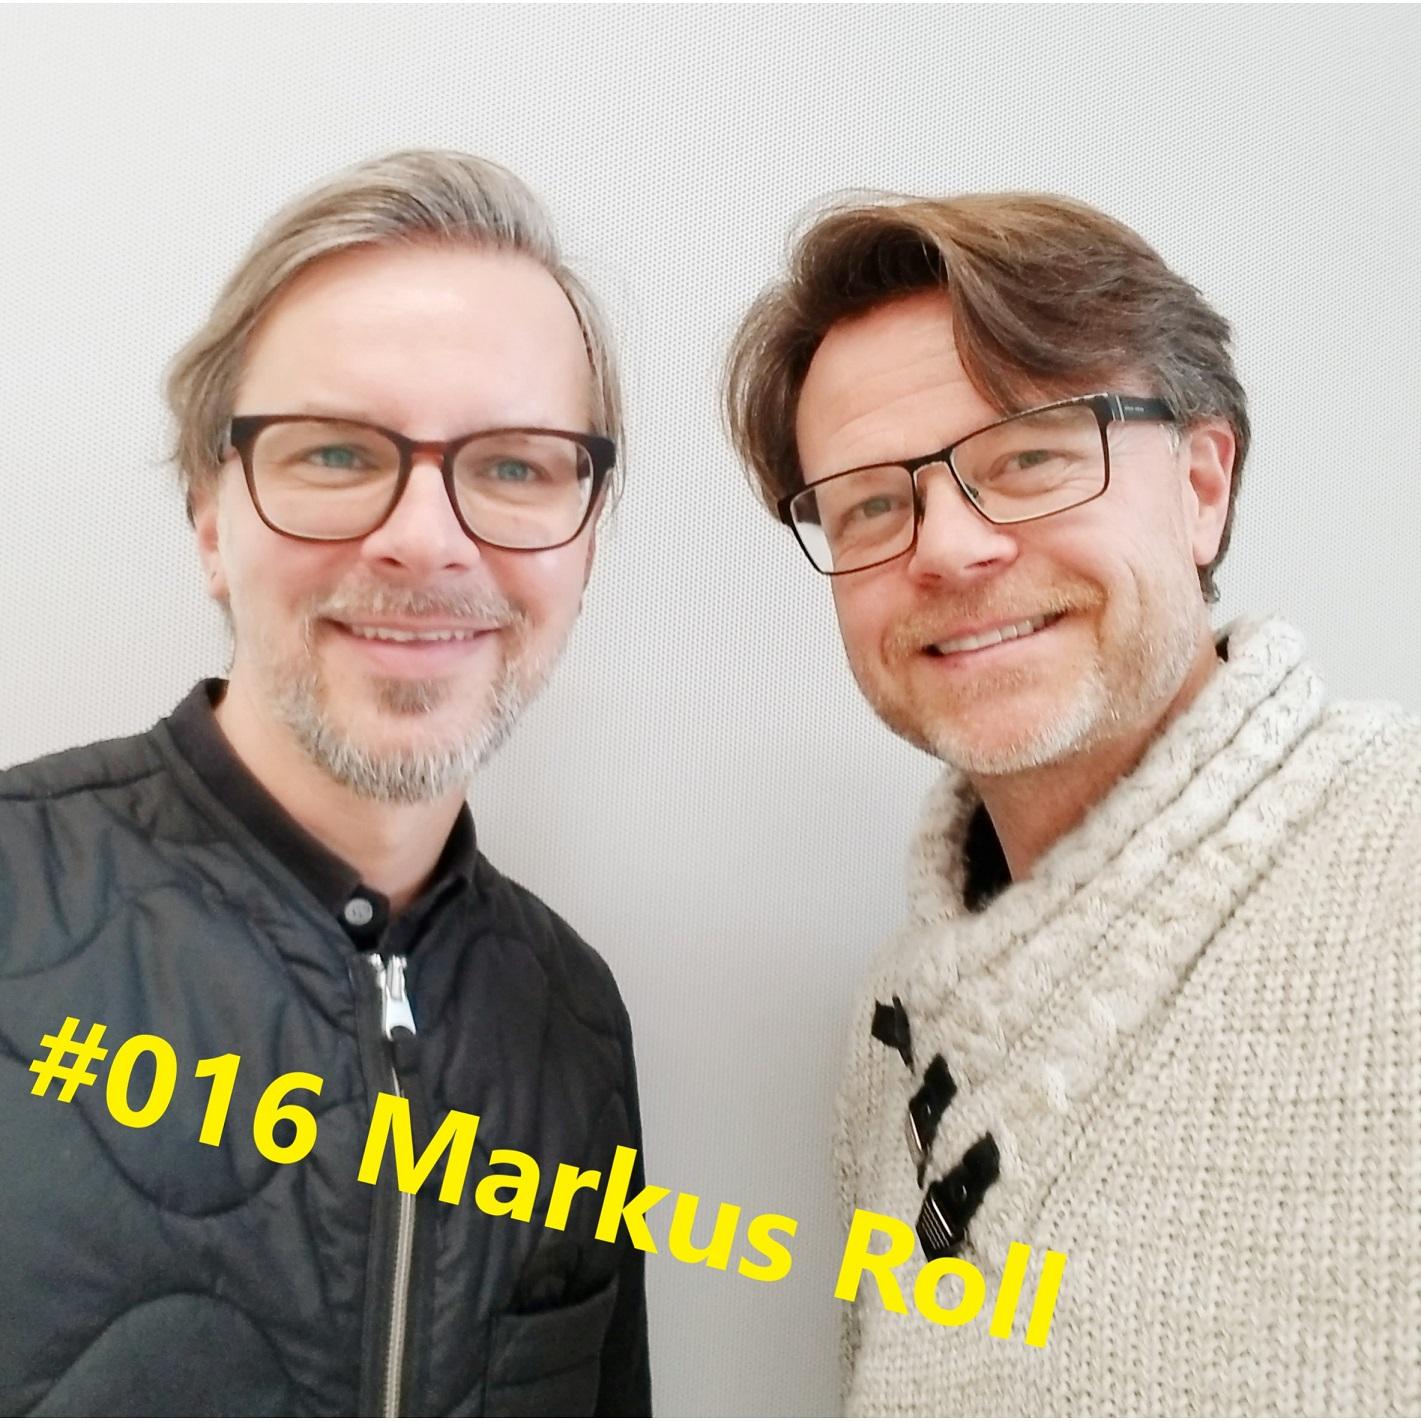 Markus Roll